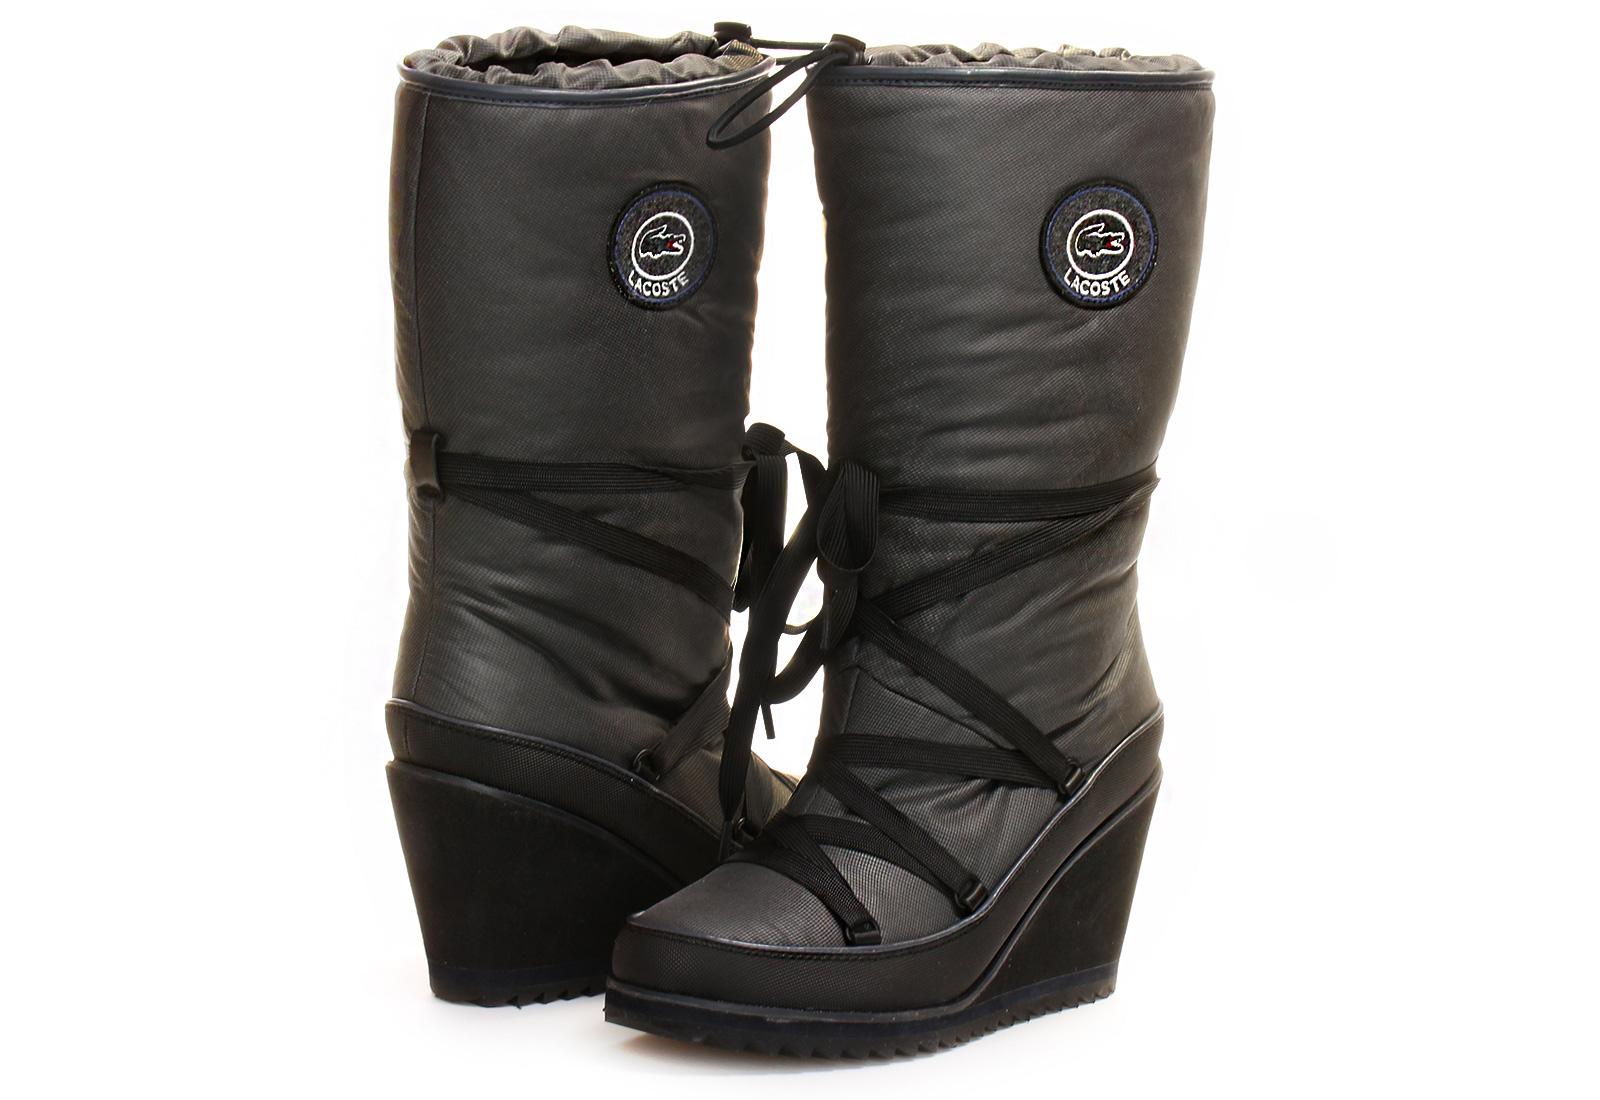 c7e36aed8475c Lacoste Boots - Aubina - 133srw0127-024 - Online shop for sneakers ...